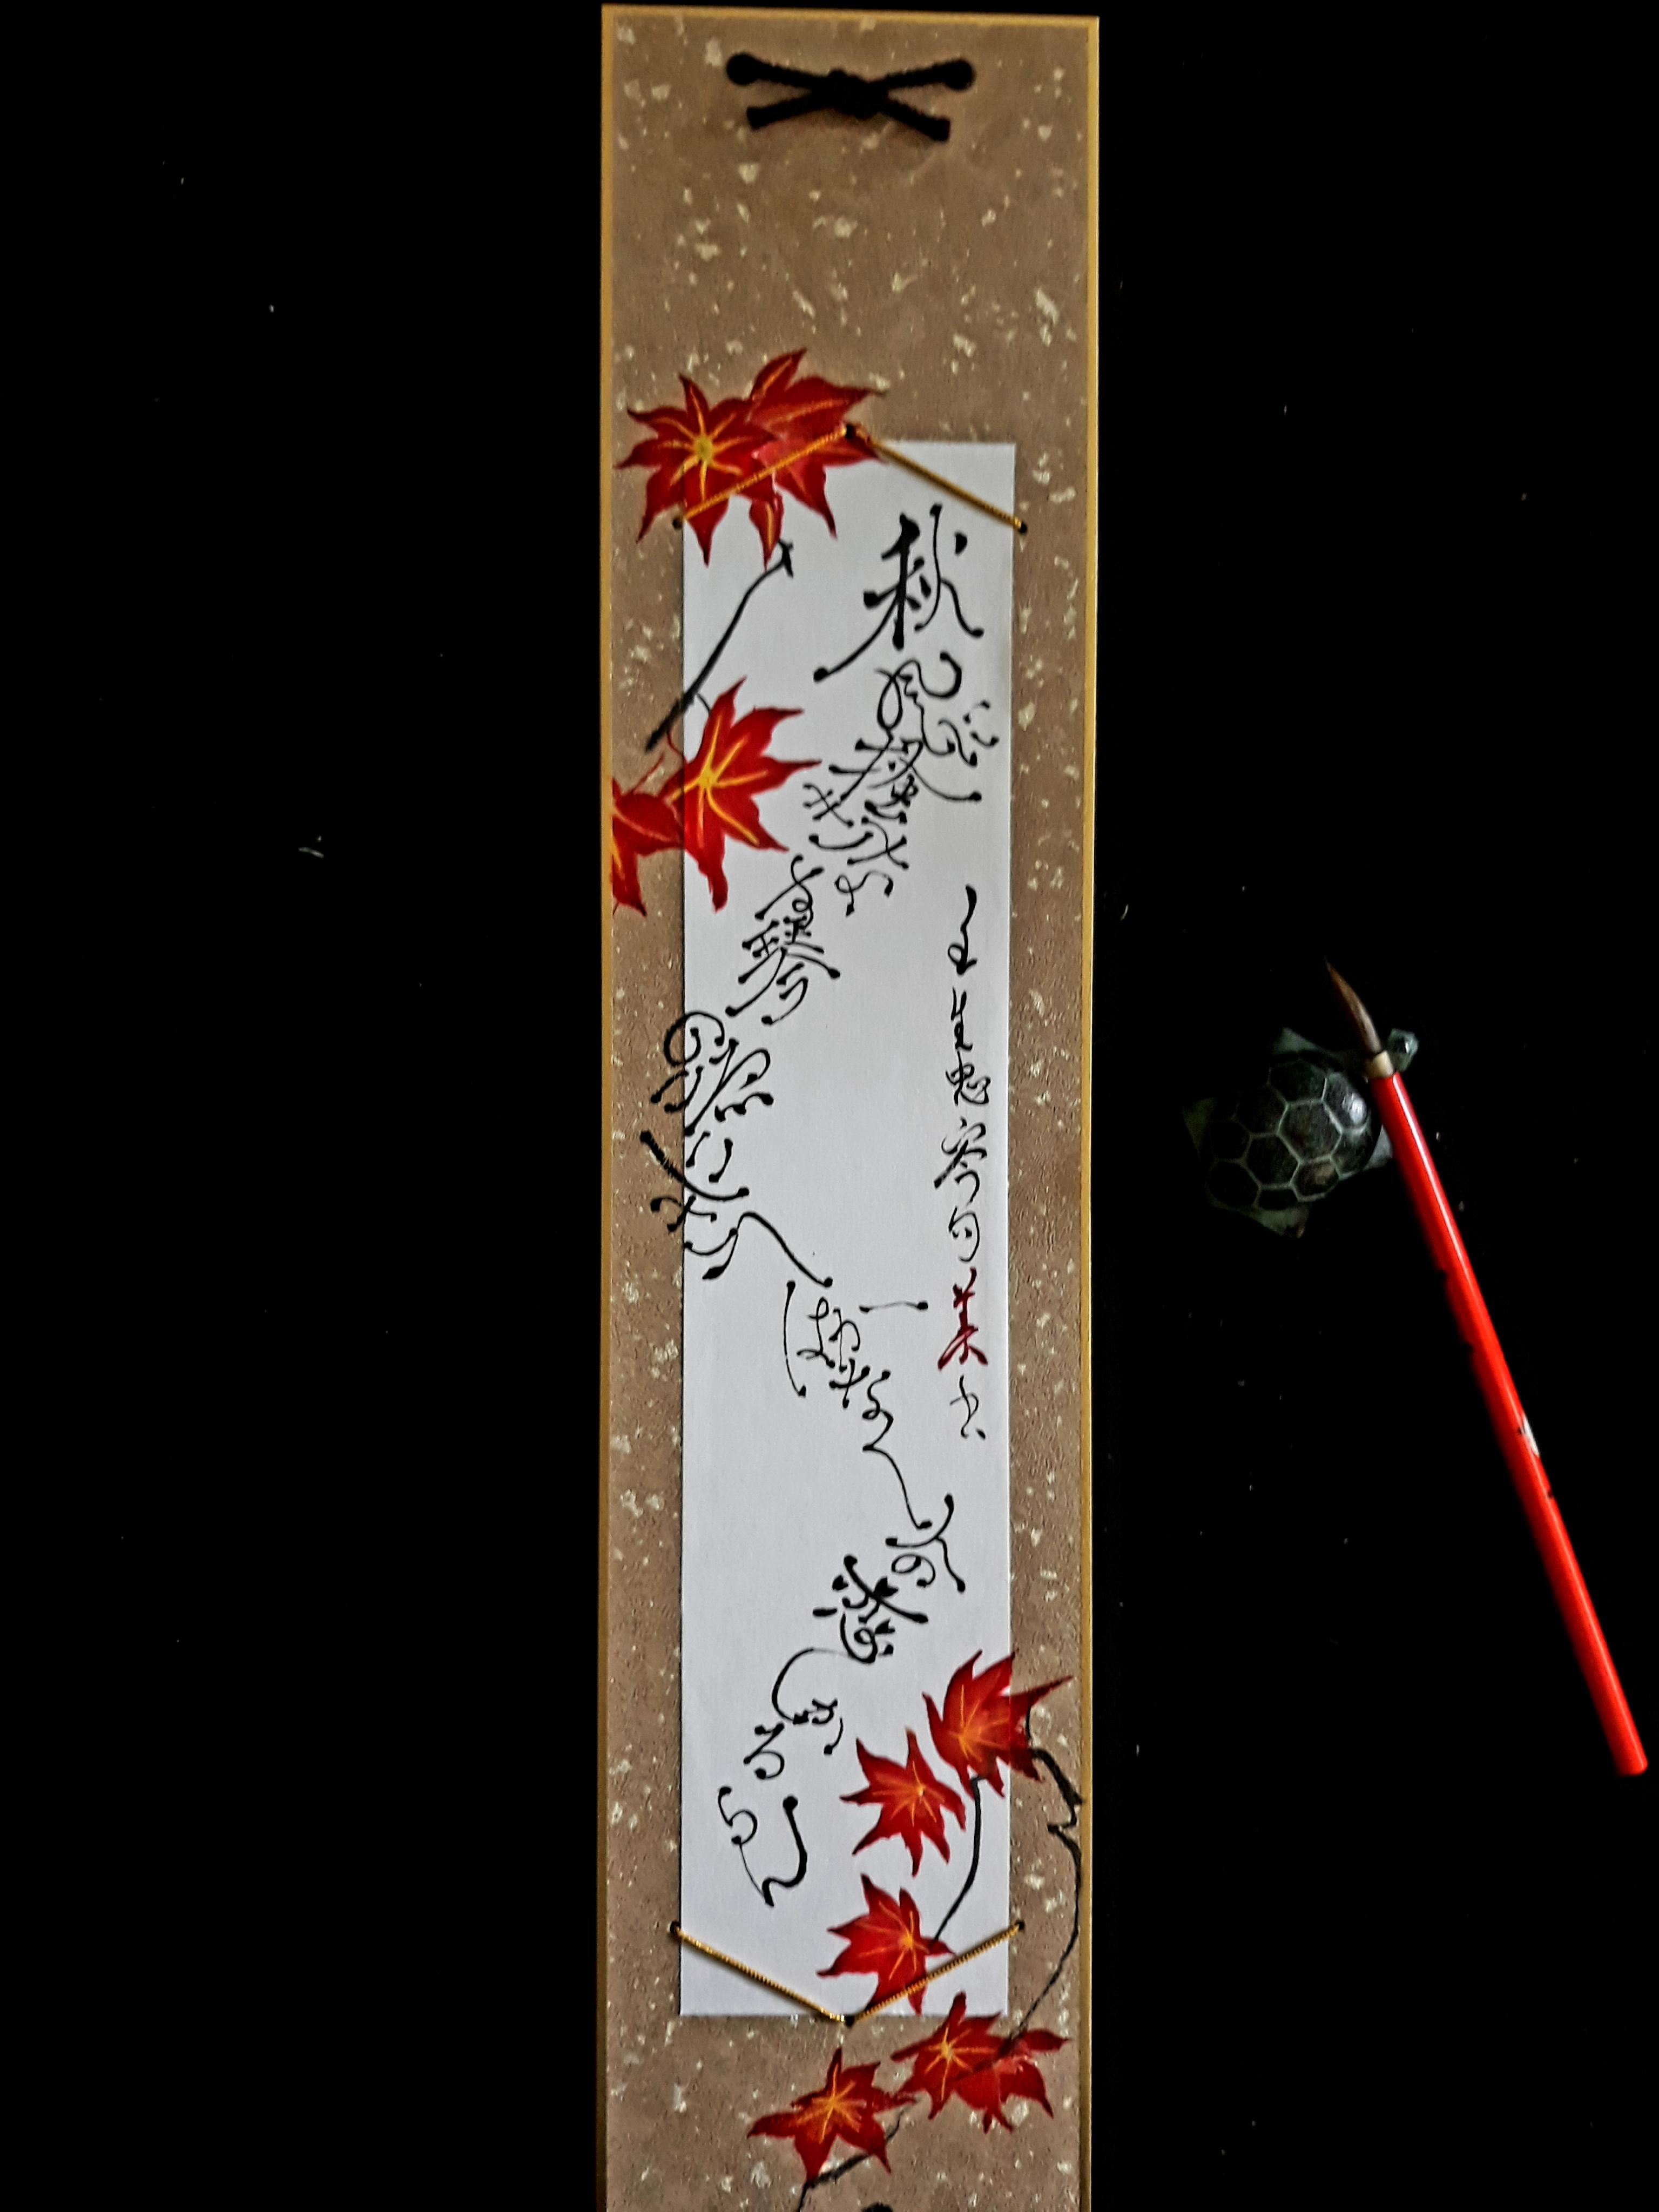 VENDU 短冊 Tanzaku 11.5cm x 51 cm